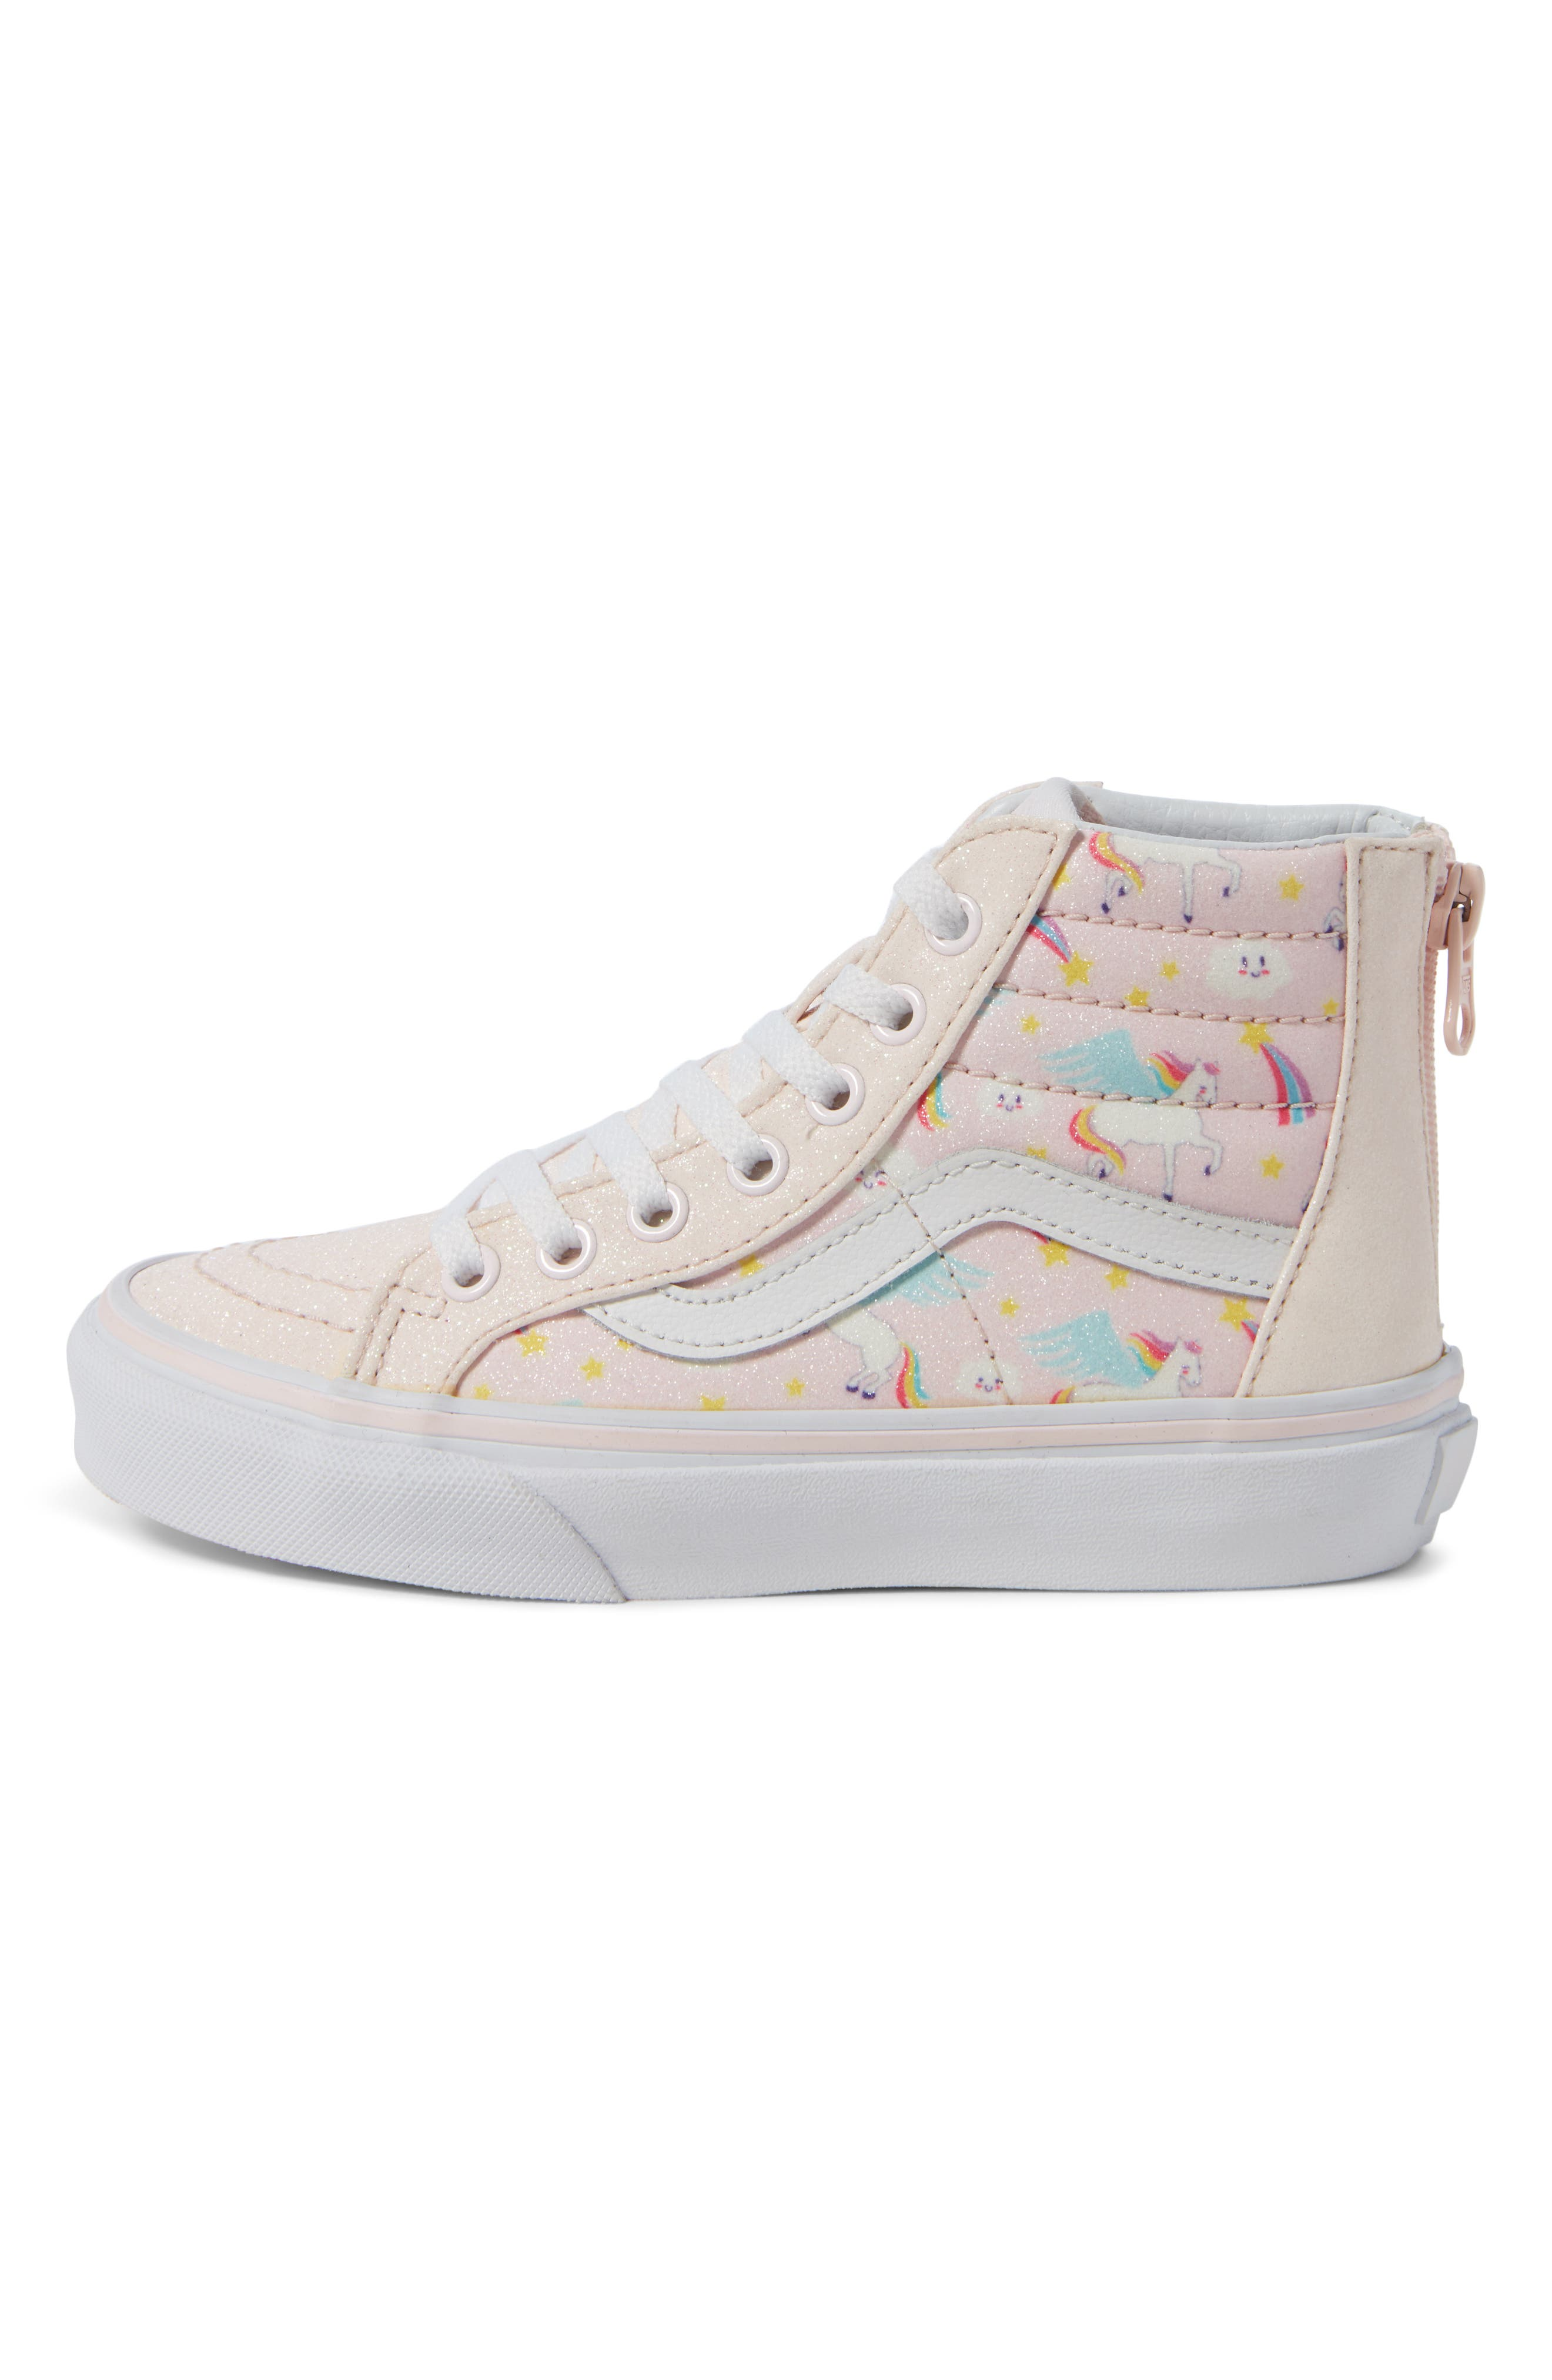 Sk8-Hi Zip Sneaker,                             Alternate thumbnail 3, color,                             GLITTER PEGASUS PINK/ WHITE